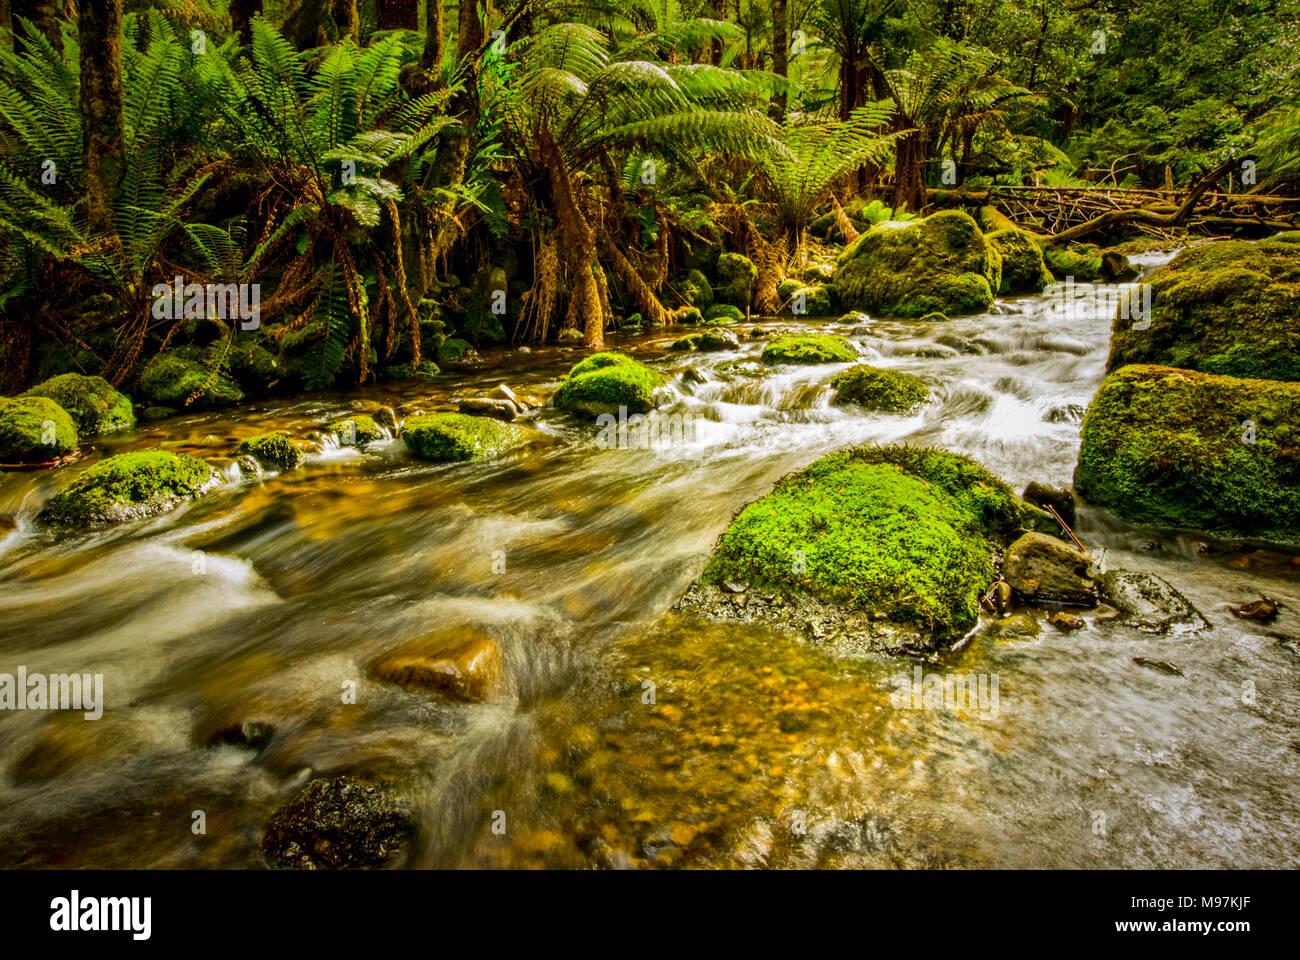 Australien, Tasmanien, Lemonthyme Lodge, rundwegzellen, Schützgebiet Stockbild